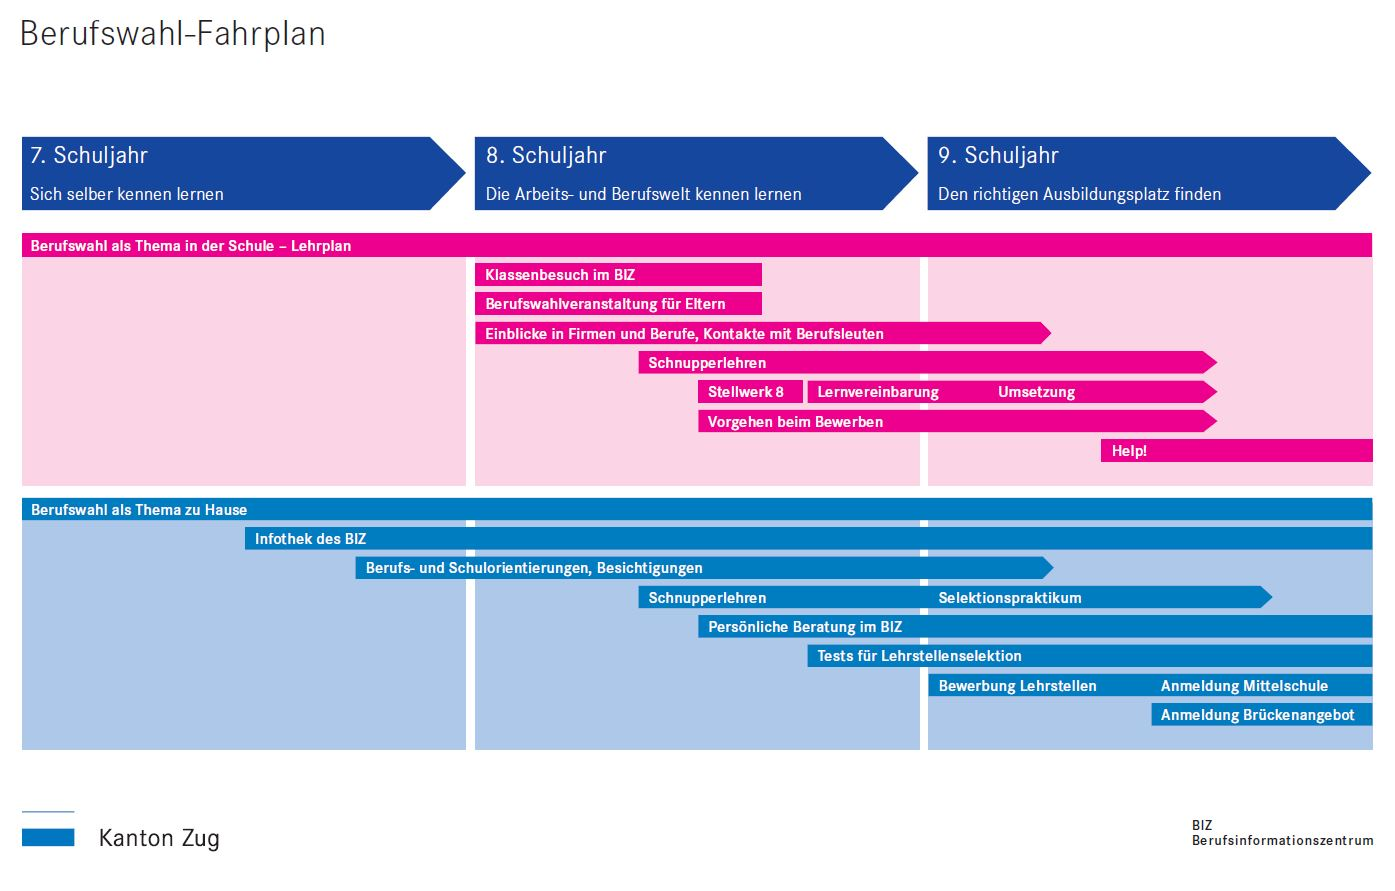 Preview image for LOM object Berufswahl-Fahrplan Zug